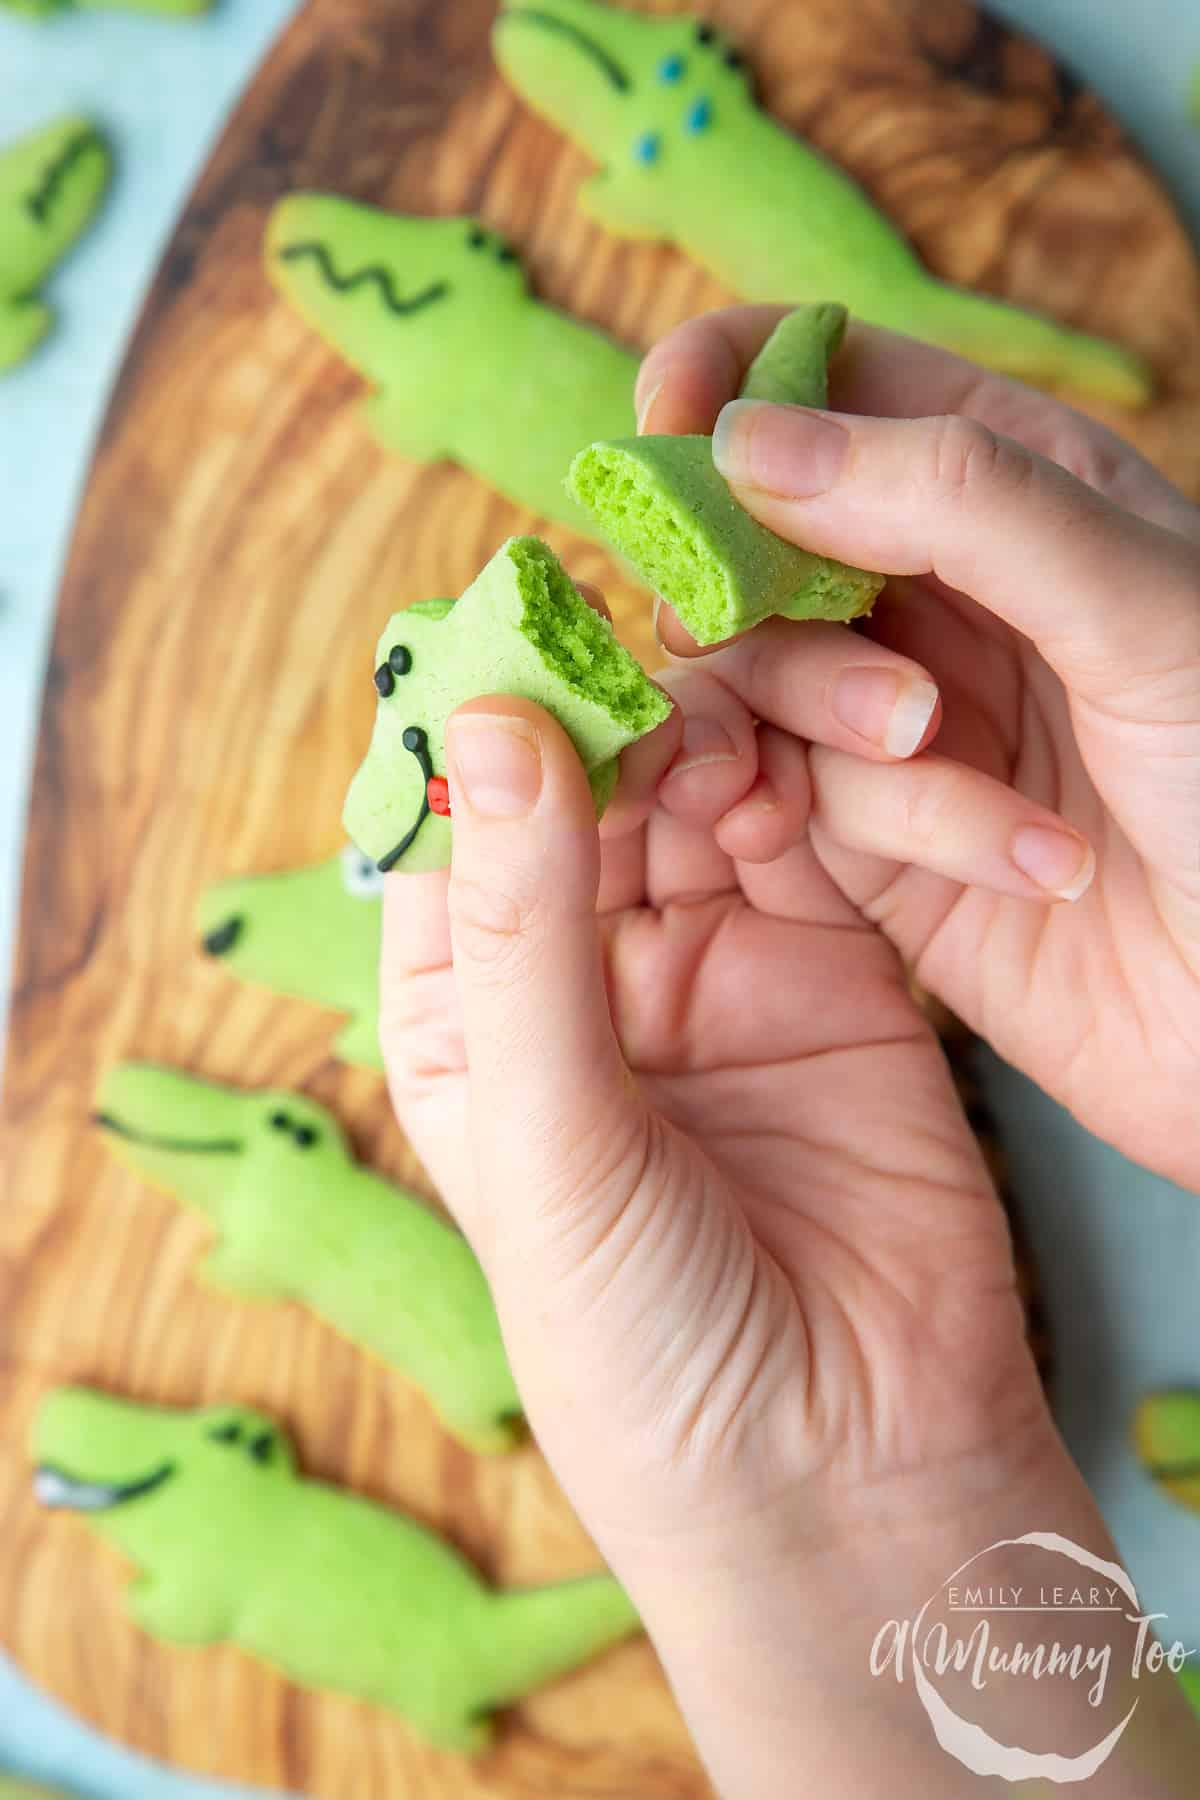 Hand breaking one of the crocodile cookies in half.